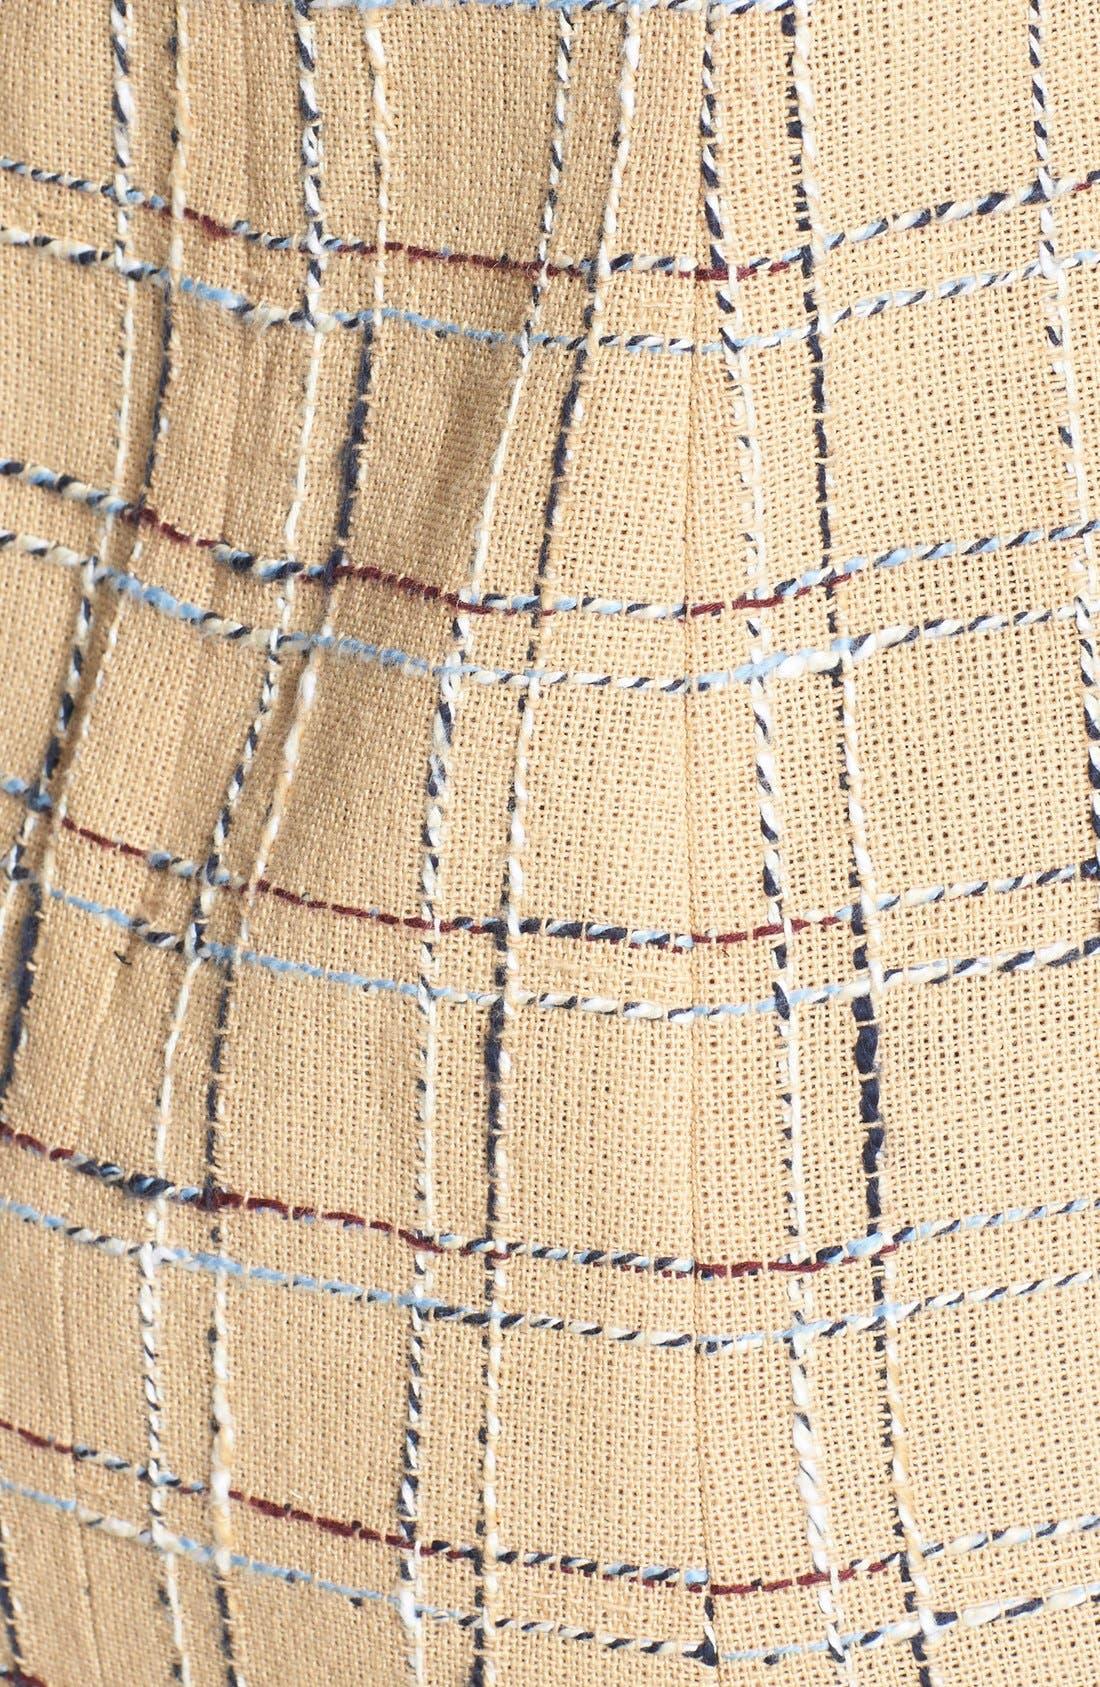 Alternate Image 3  - Tory Burch 'Evie' Woven Cotton & Linen Sheath Dress